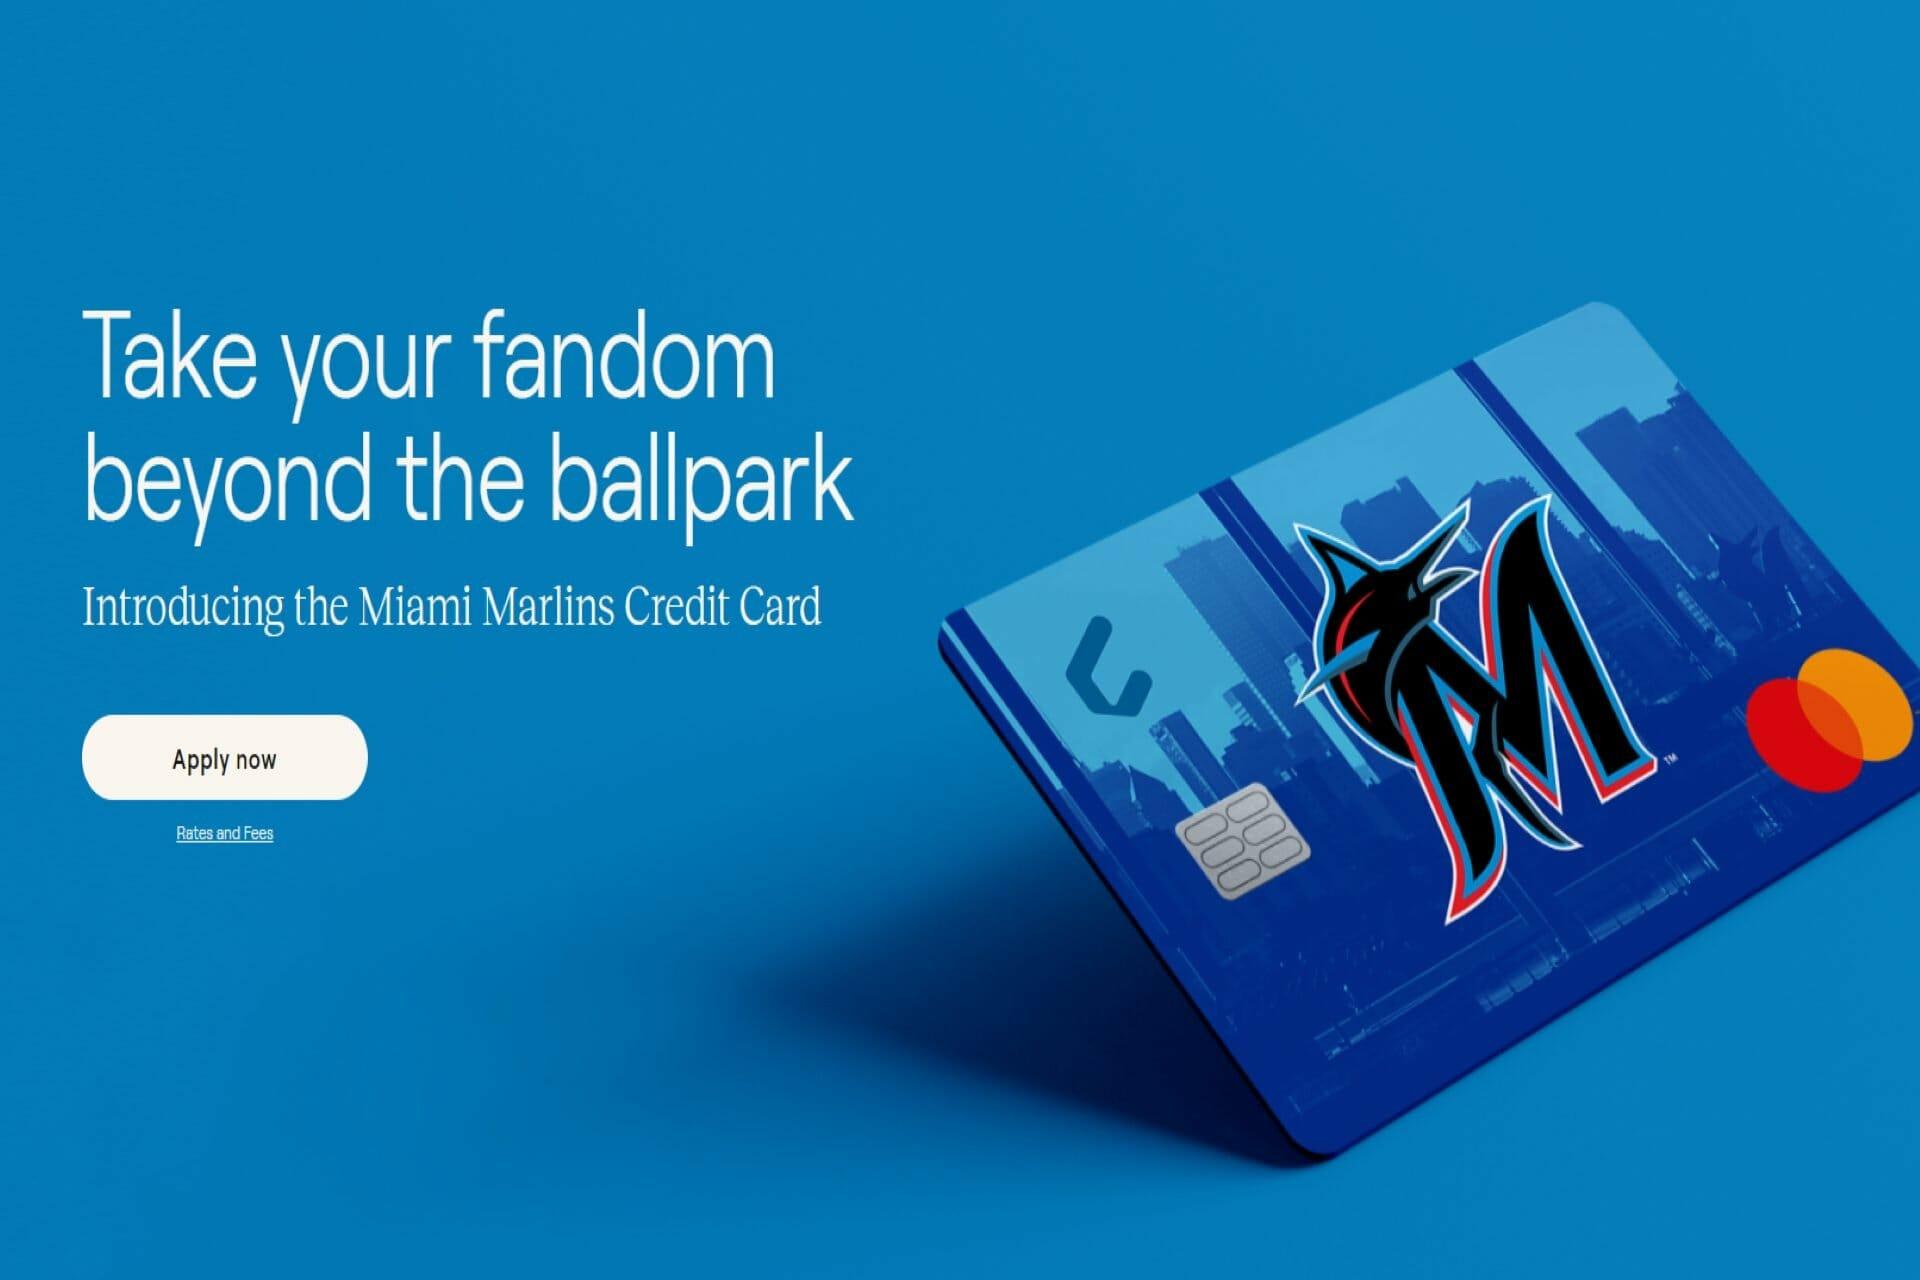 Cardless new Miami marlins